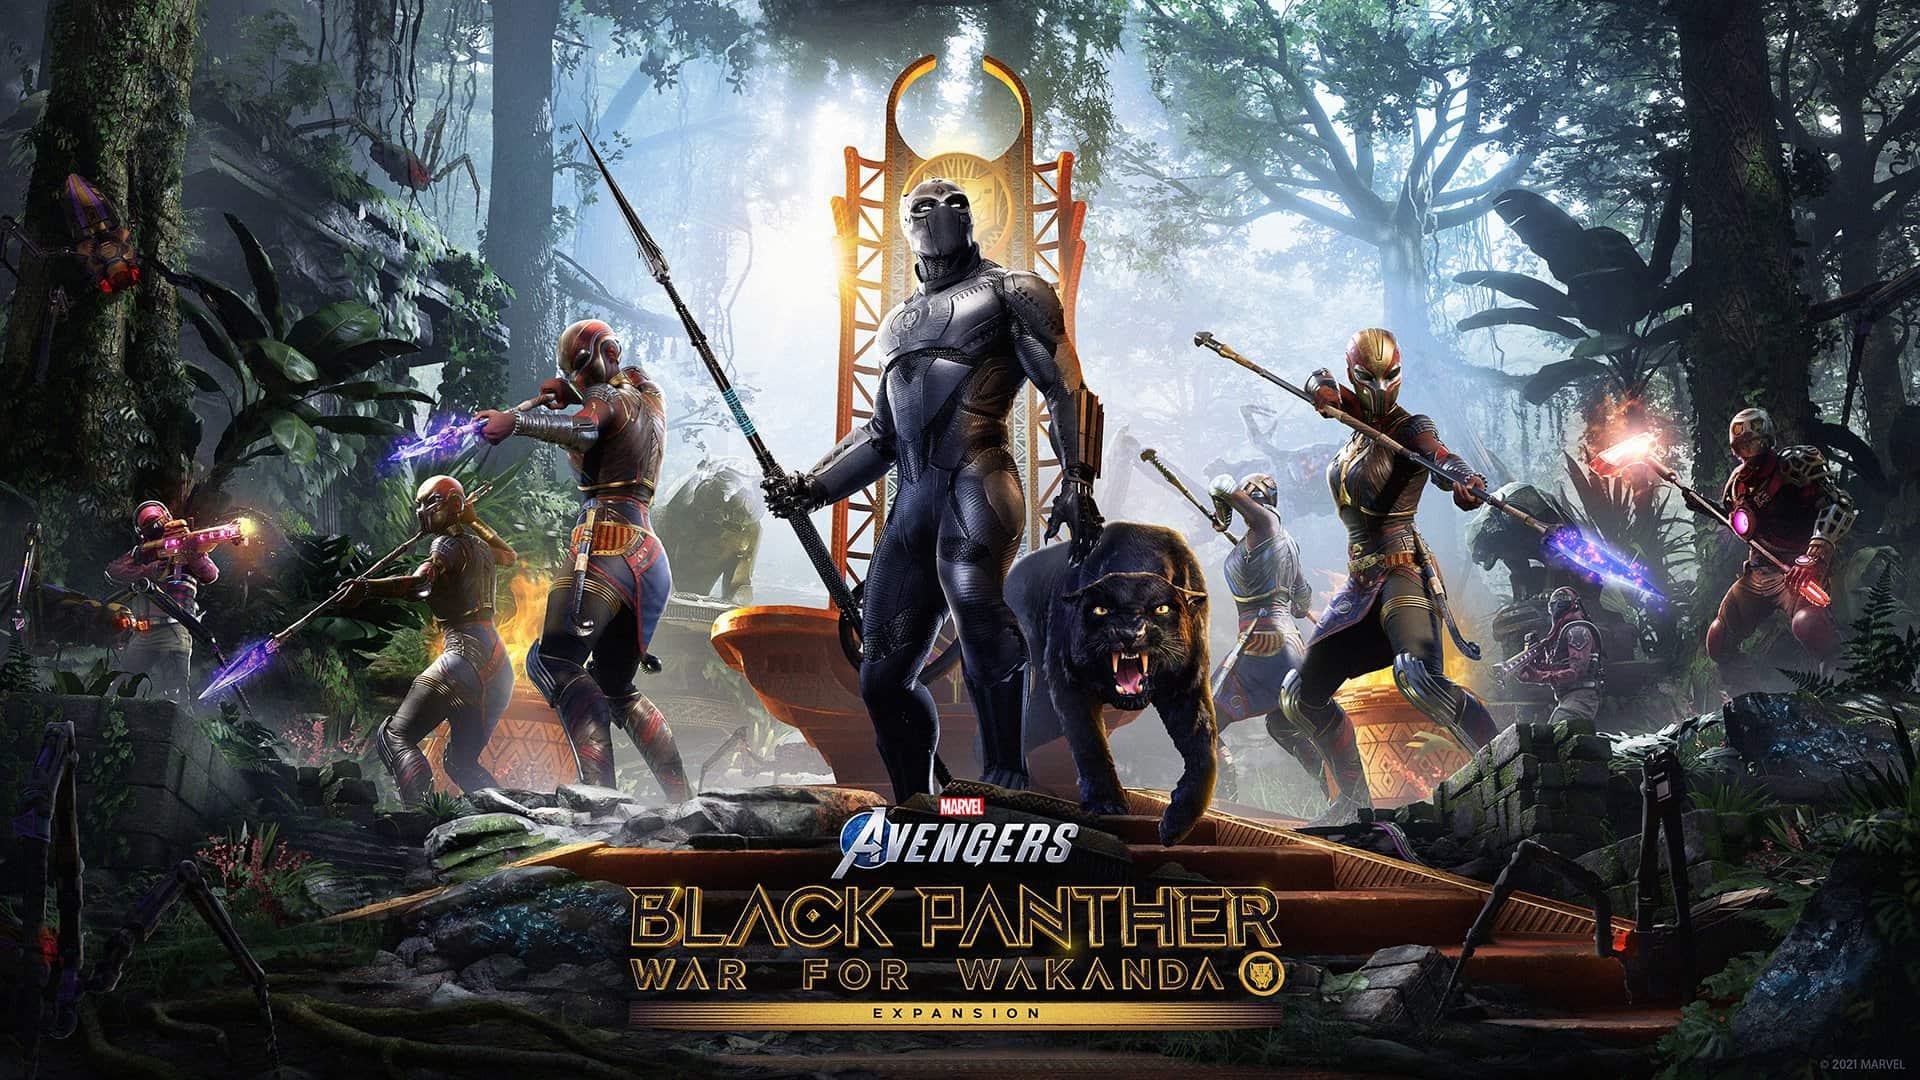 Marvel's Avengers: Black Panther - War for Wakanda se lanzará el 17 de agosto 3